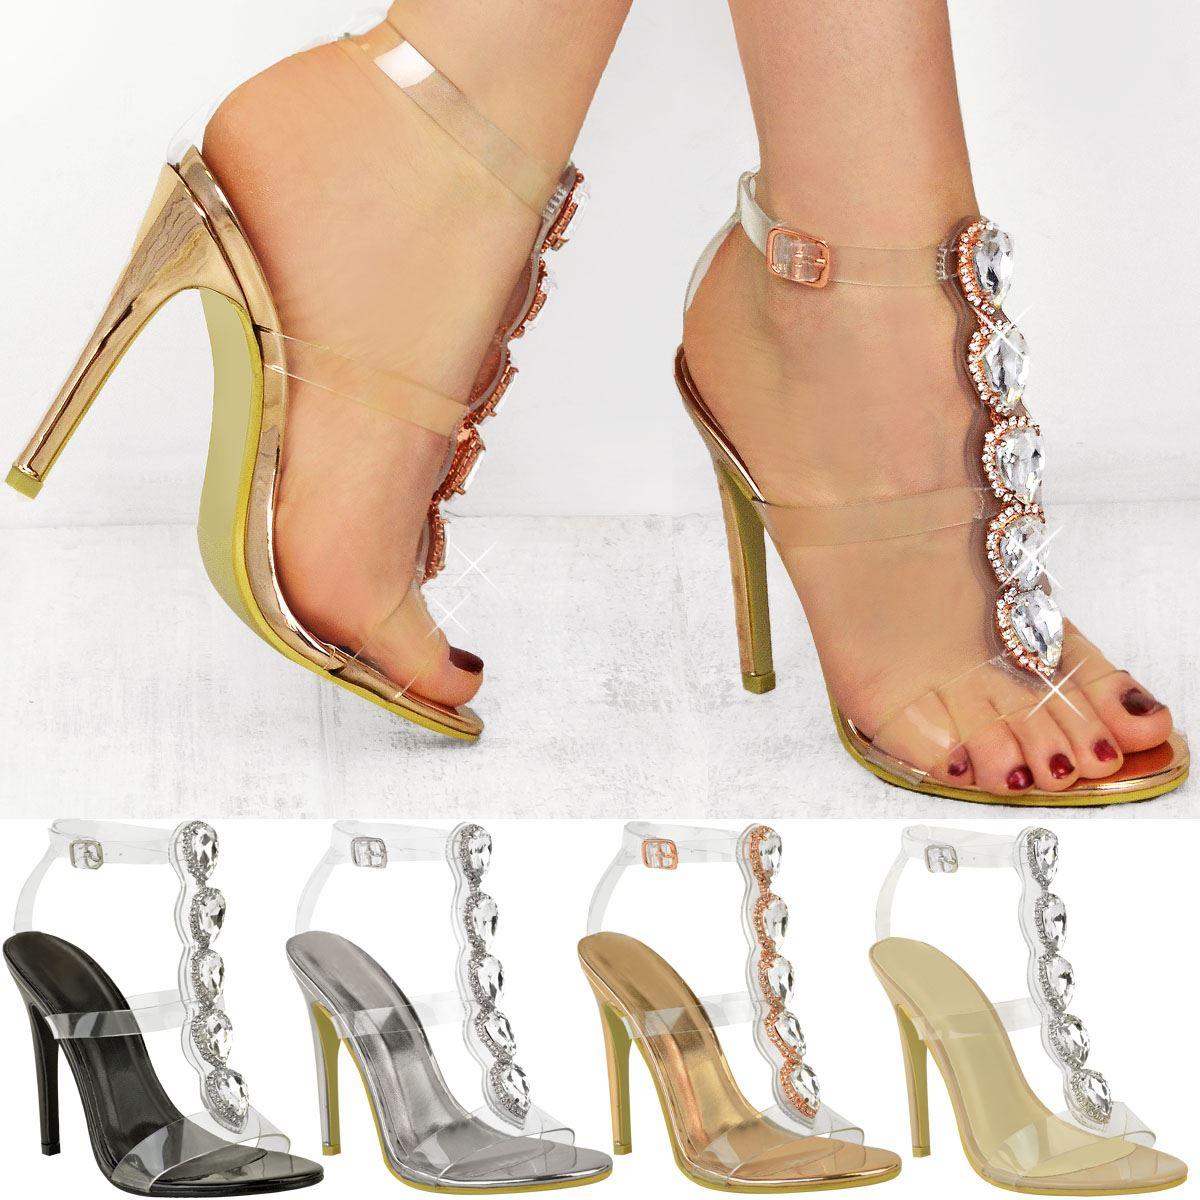 5ee1f11dfa4 New Womens Ladies Perspex High Heel Jewel Stiletto Sandals Strappy ...